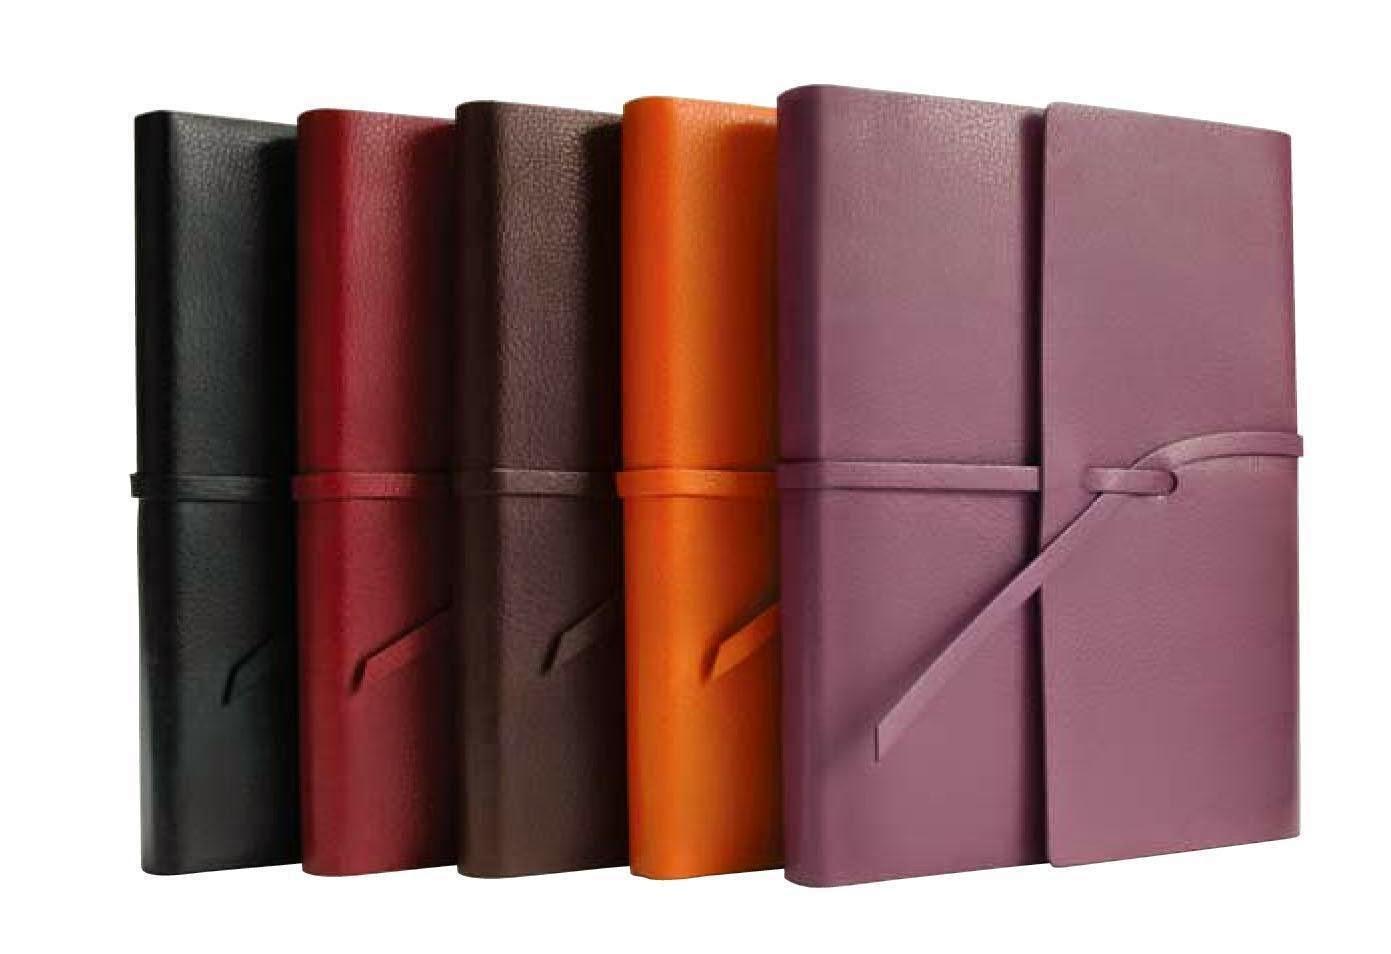 0939391080 xưởng sản xuất sổ da giá rẻ, sổ da cao cấp, sổ da dán gáy, sổ còng, ví da, bóp namecard